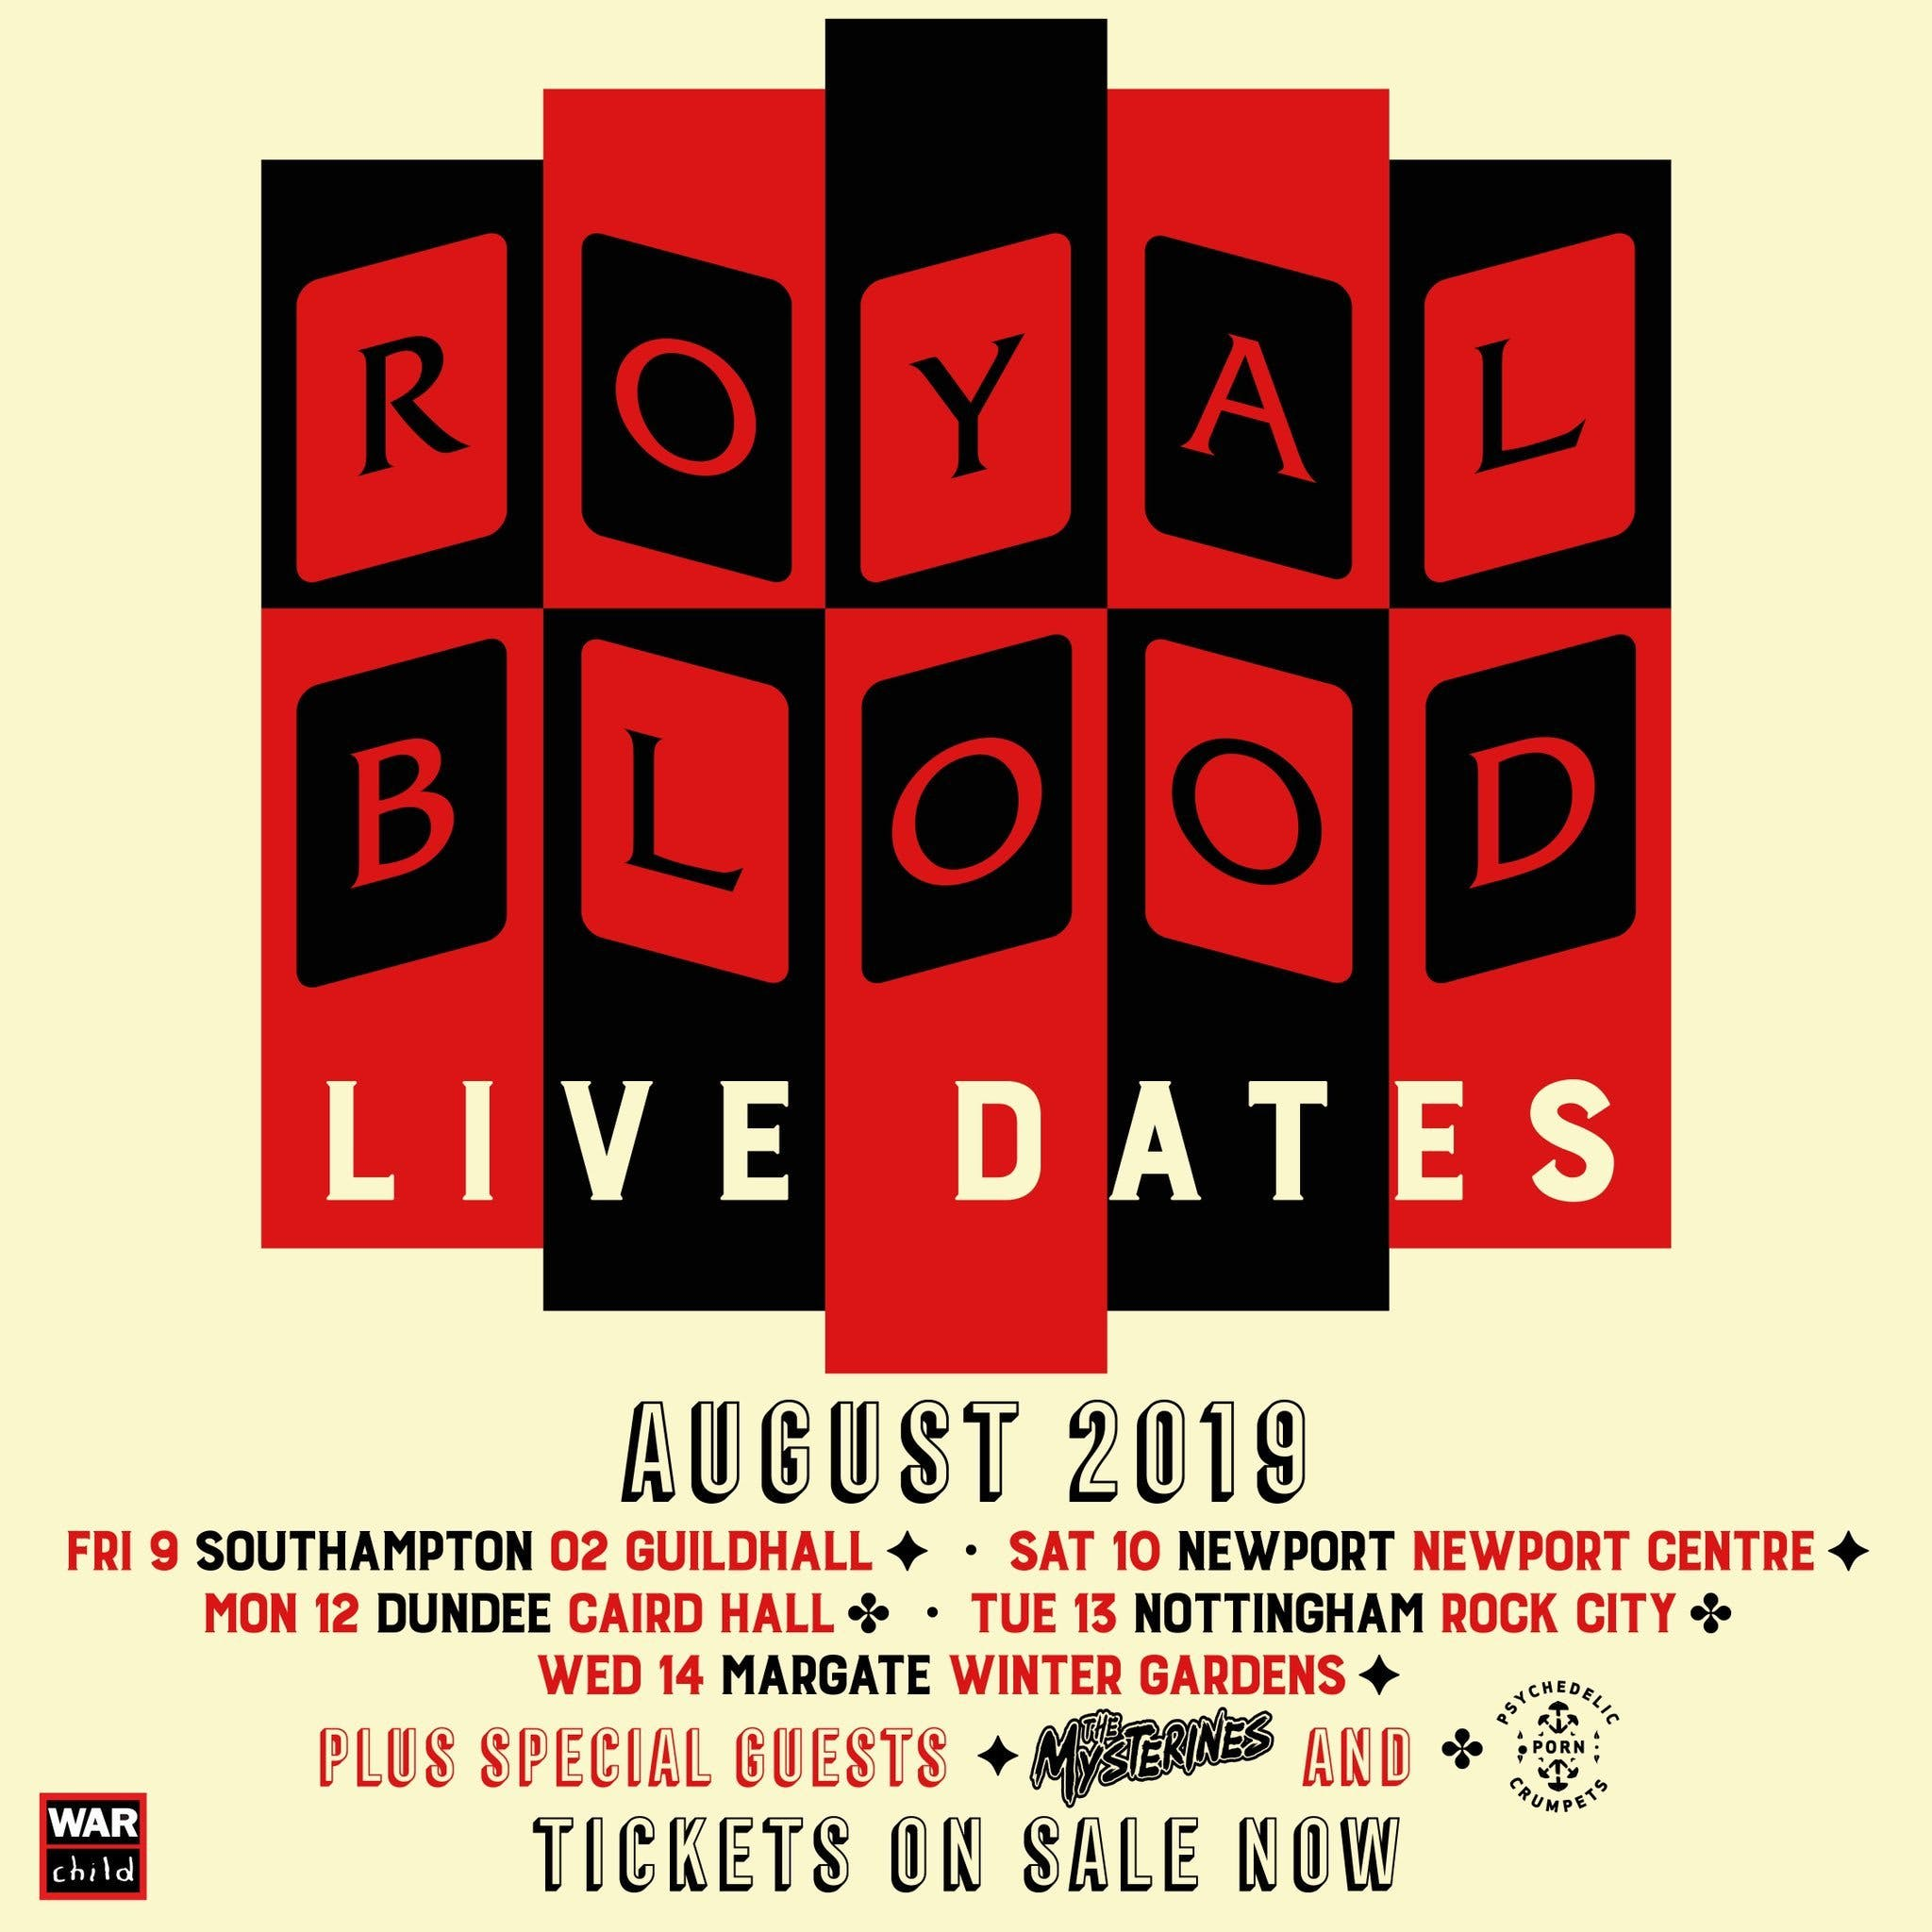 Royal Blood August 2019 Tour